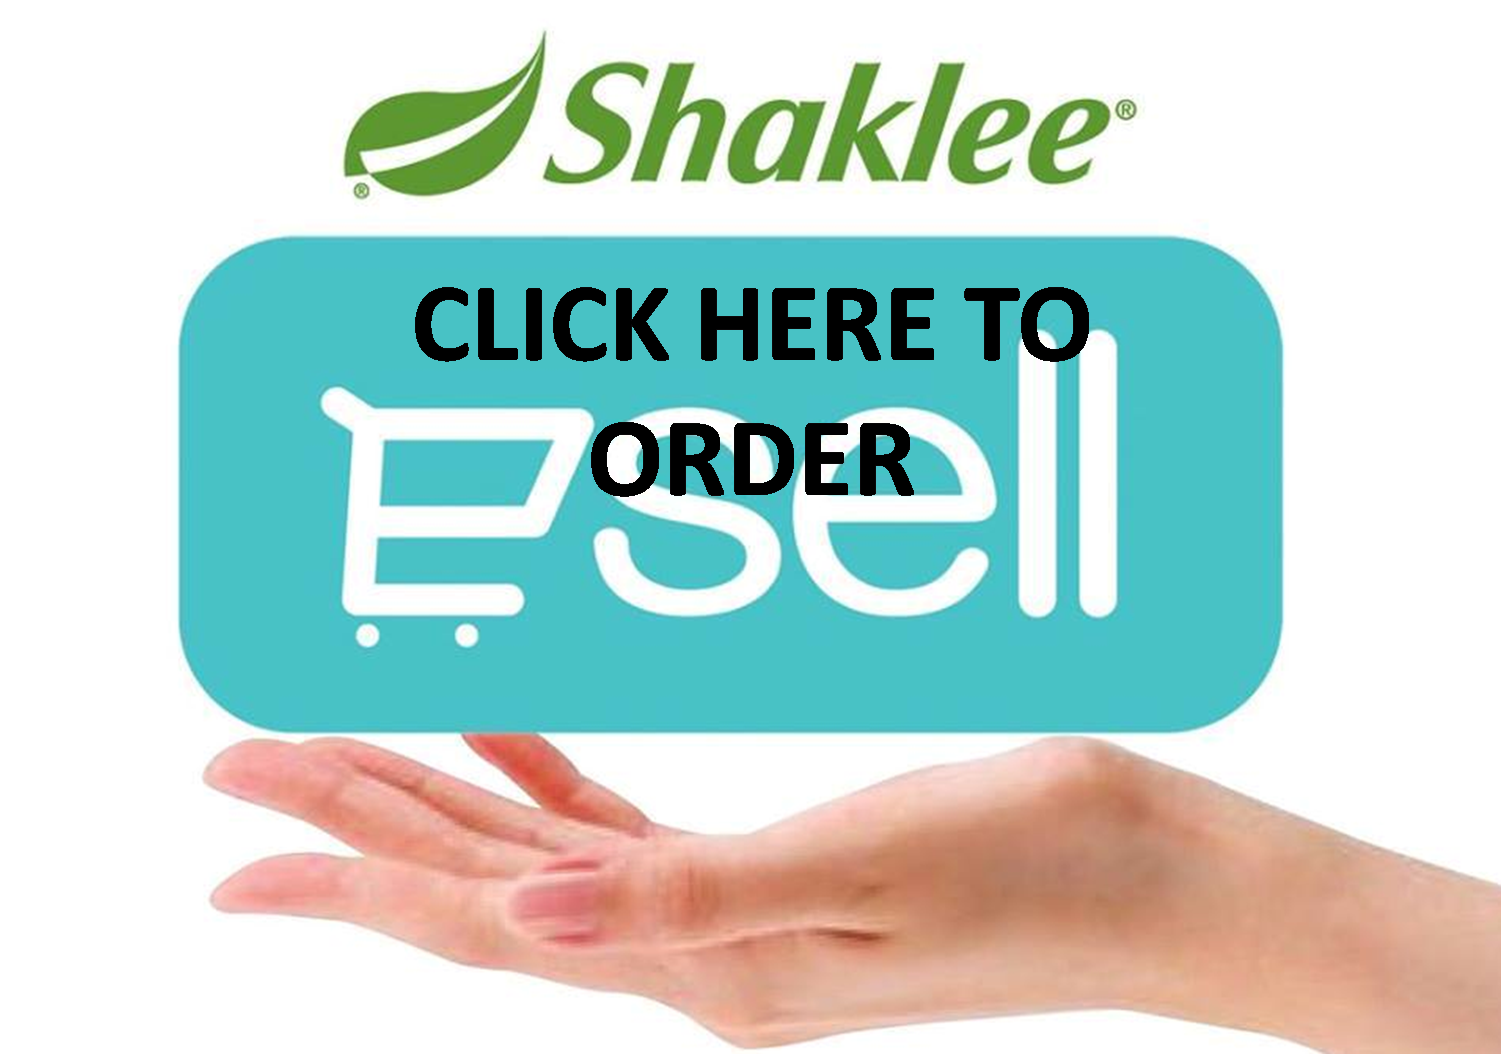 https://www.shaklee2u.com.my/widget/widget_agreement.php?session_id=&enc_widget_id=ecab3a41264bb6ecc6a0ba7faec476fb